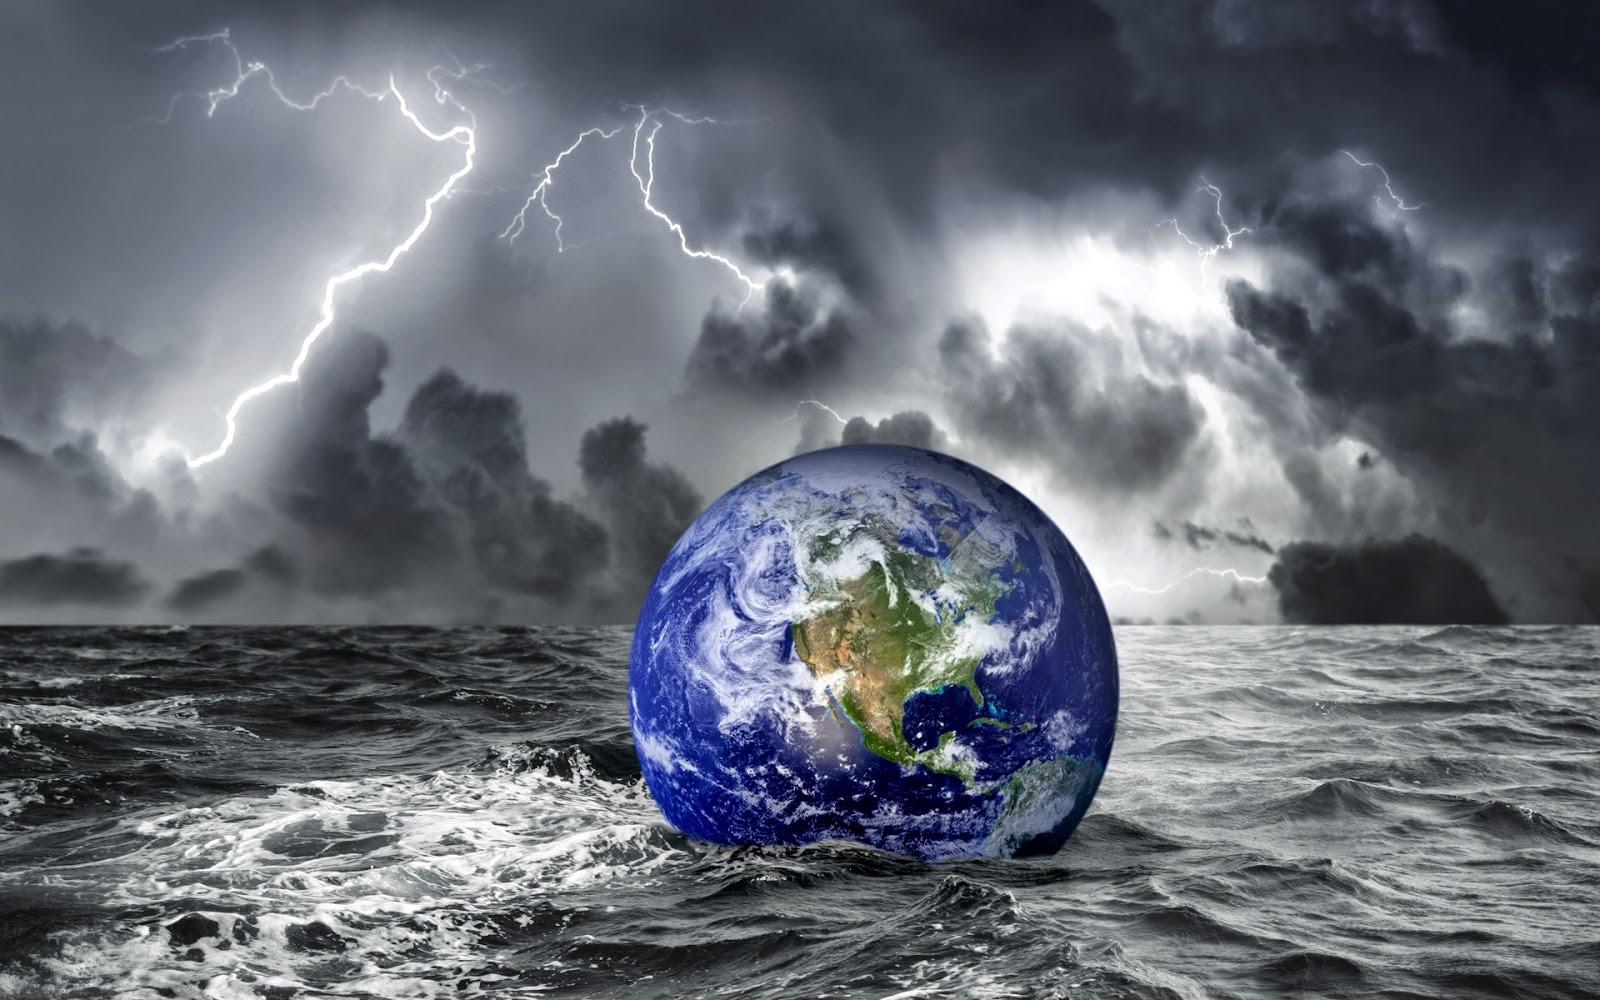 Fantasie achtergrond met globe in het water